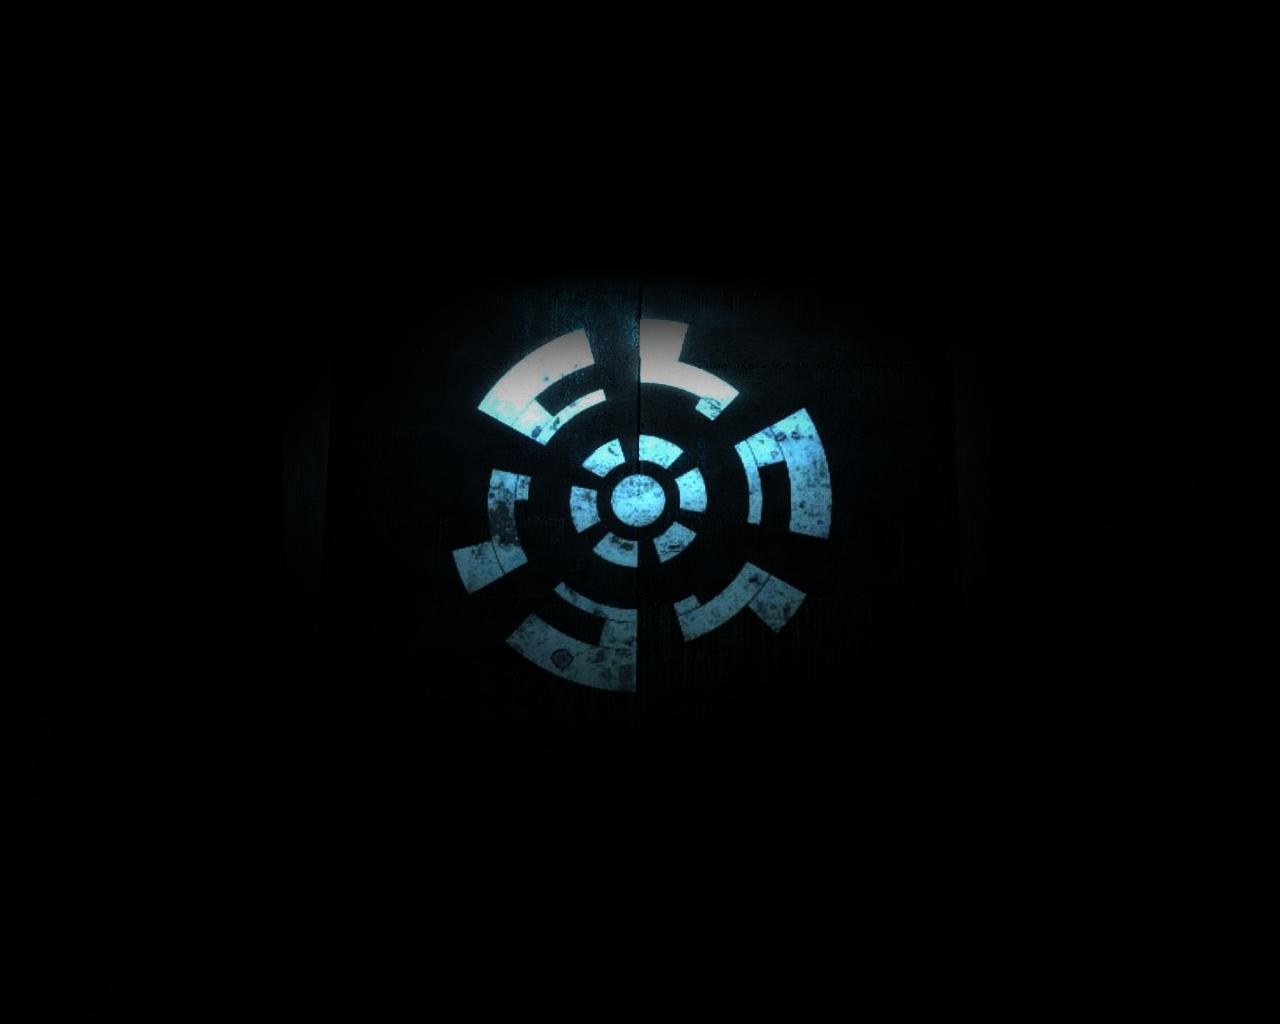 Combine Symbol by qman32 on DeviantArt